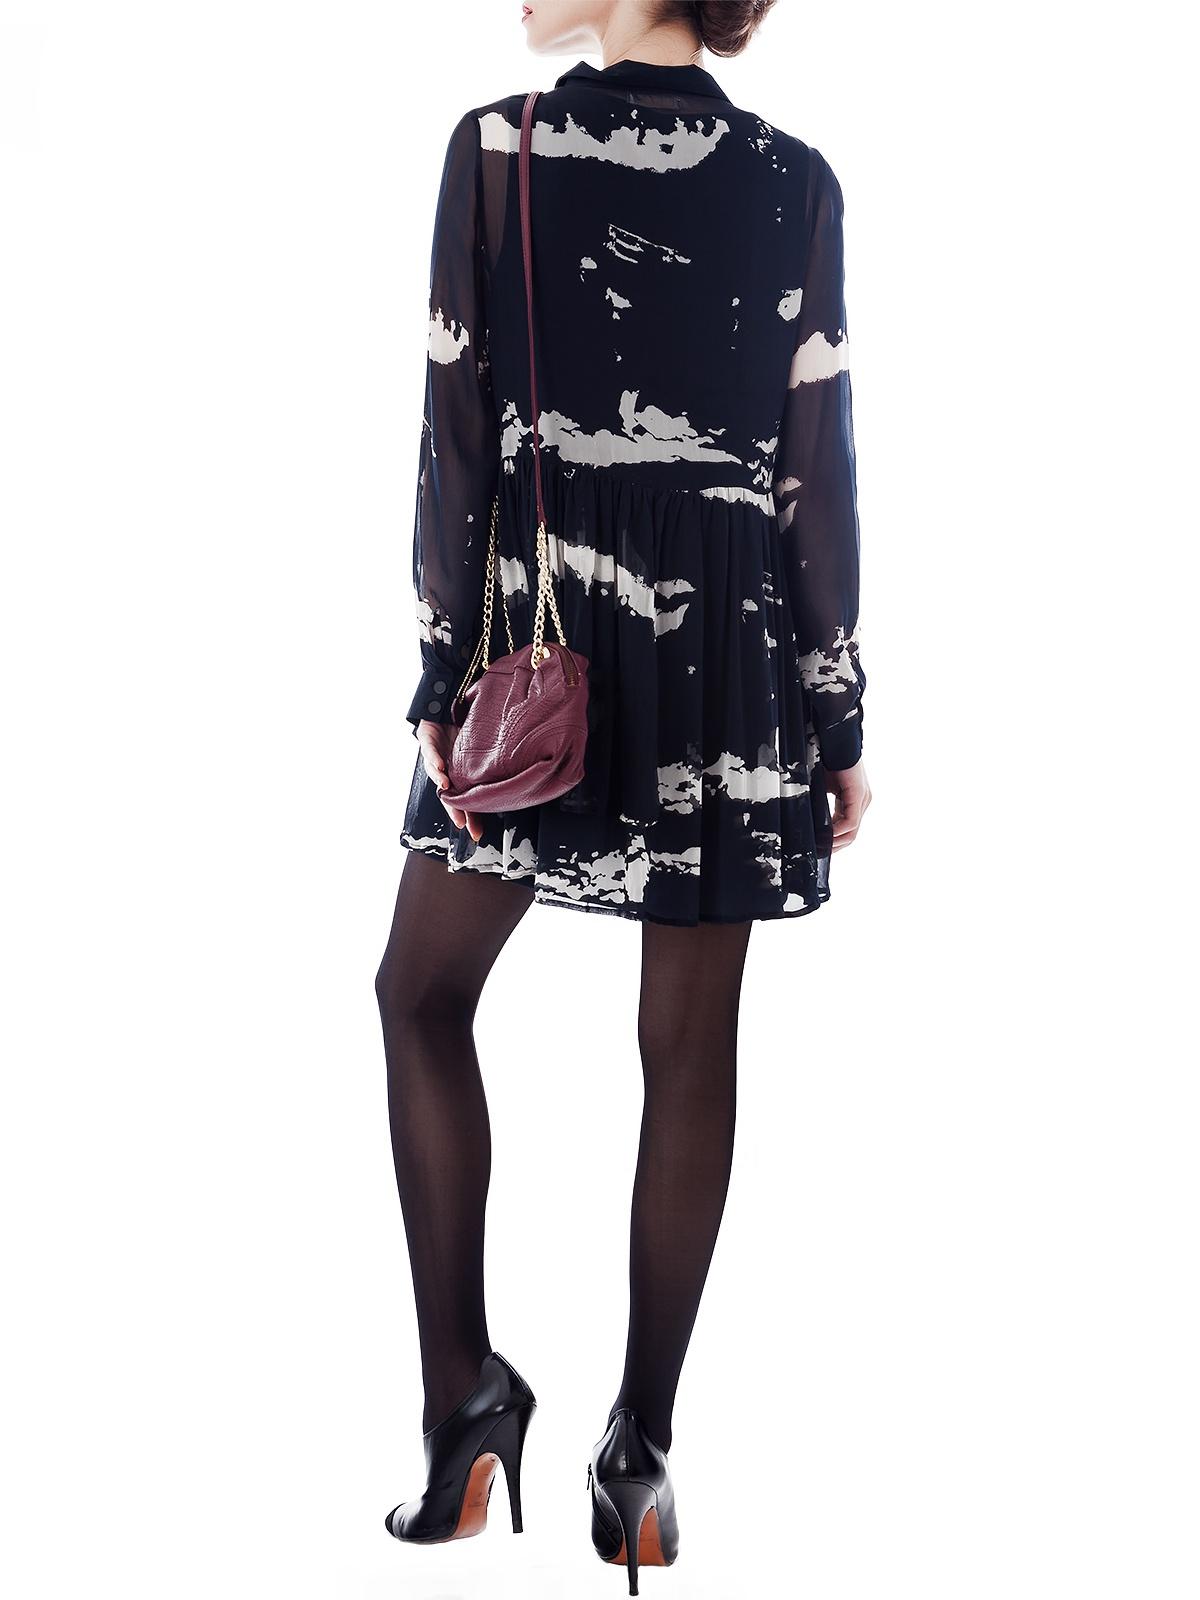 MELIS PRINT DRESS | Shop for Fashion Trends in Dresses - GIRISSIMA.COM